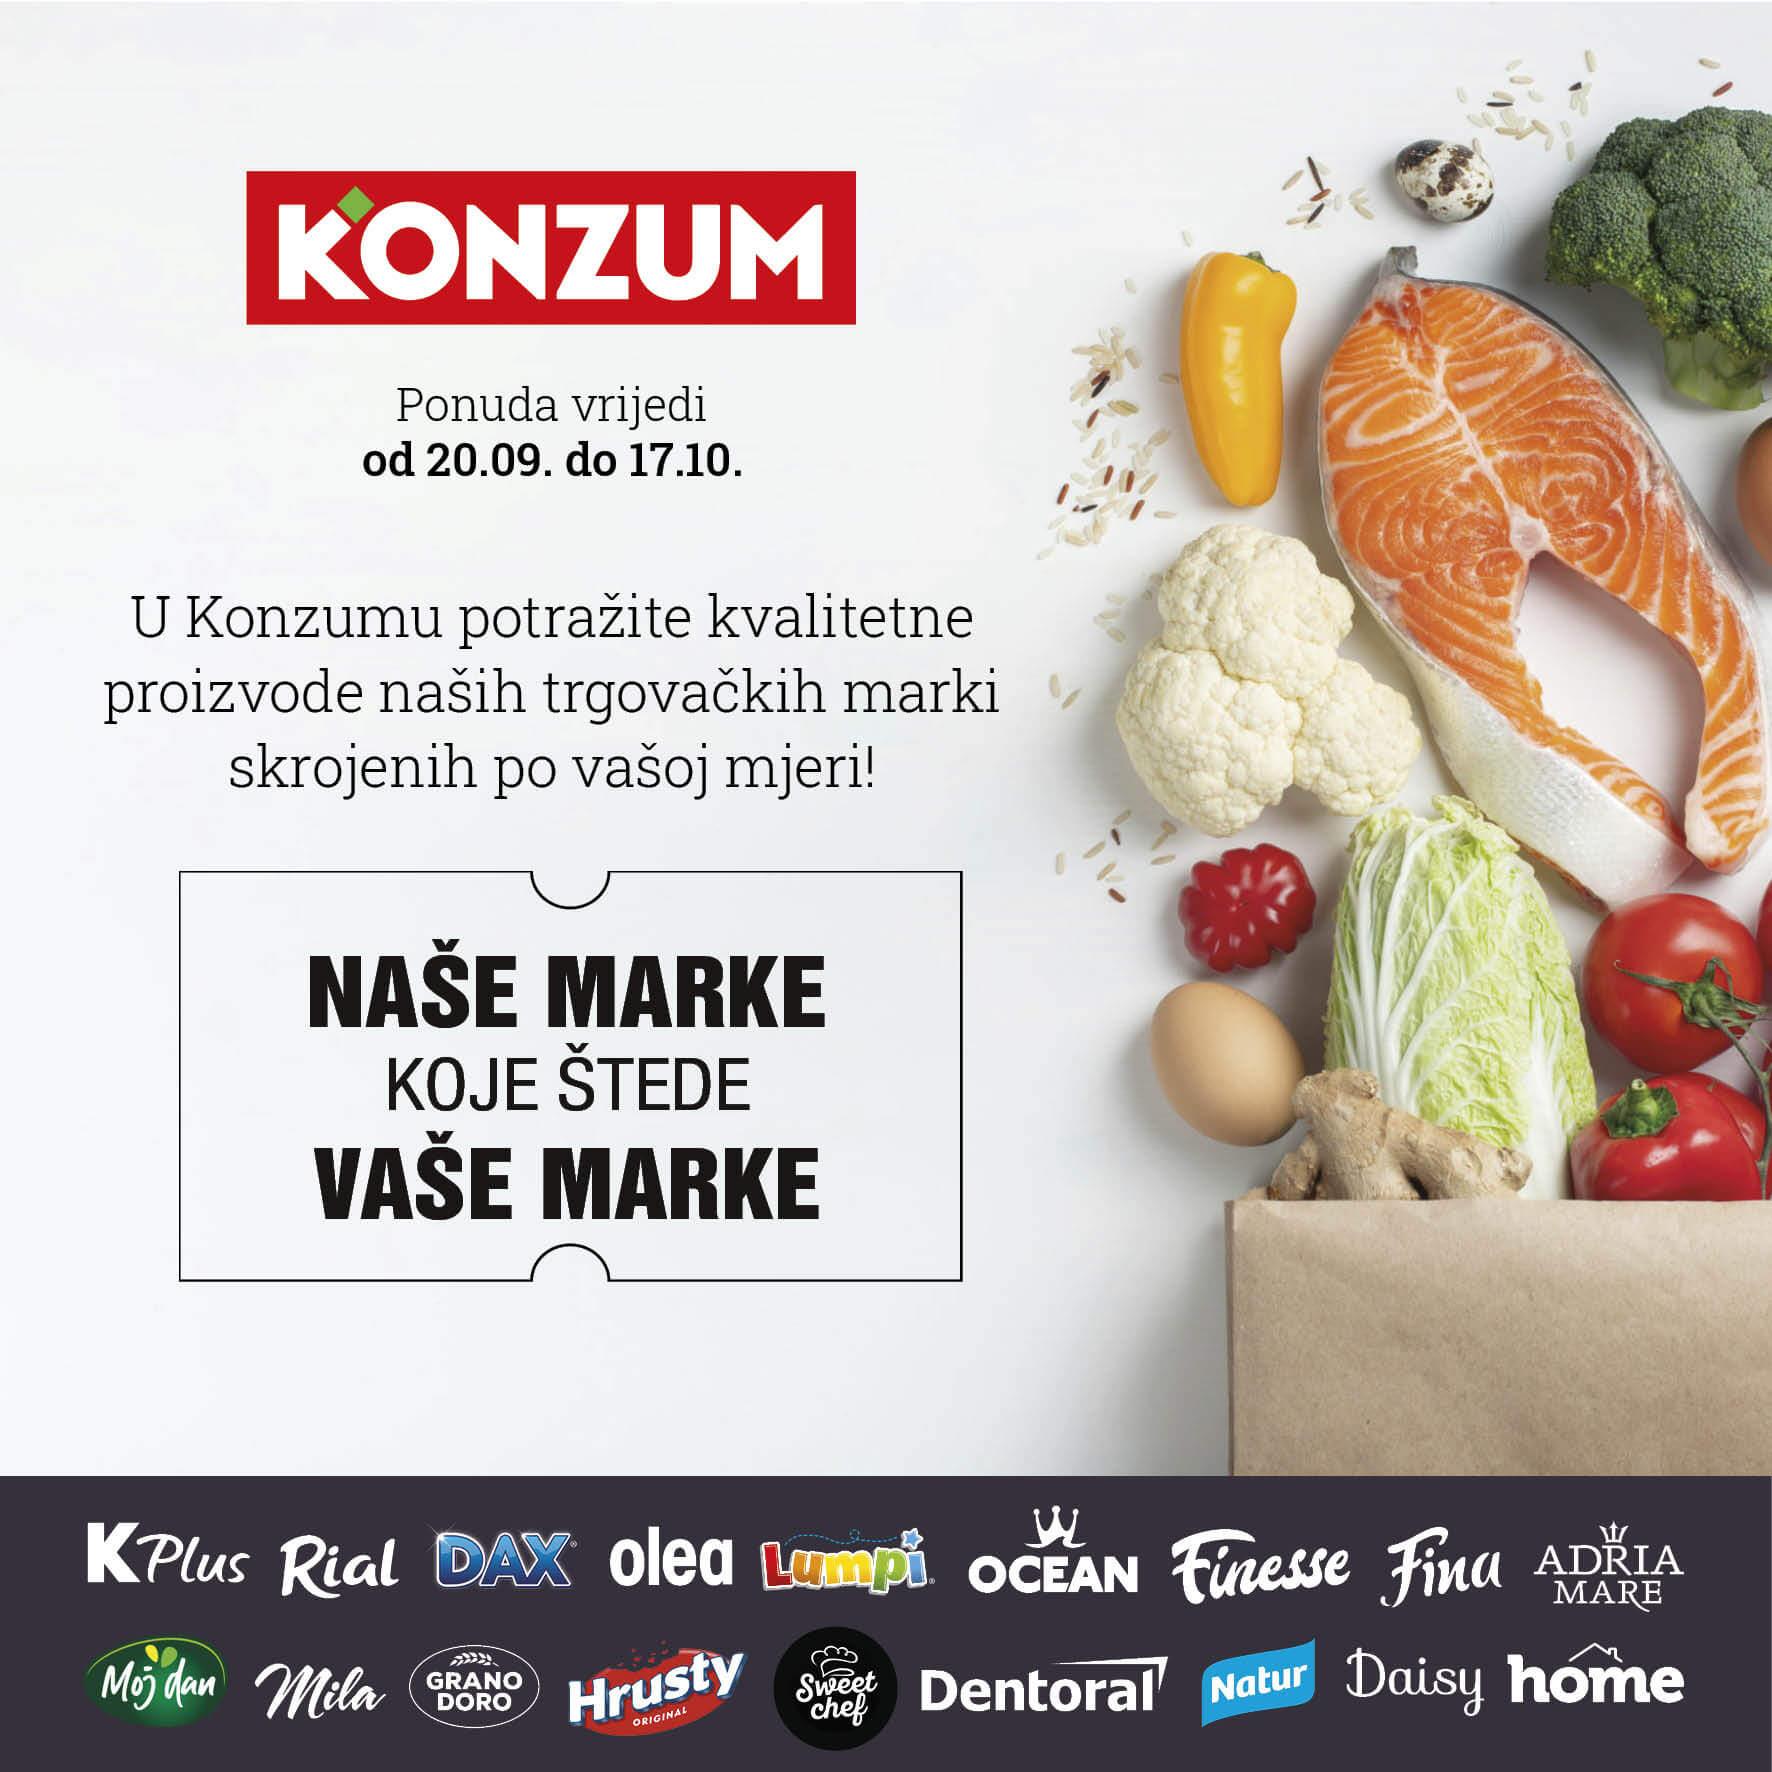 KONZUM Katalog Nase marke koje stede vase marke 22.9.2021. 17.10.2021. Page 01